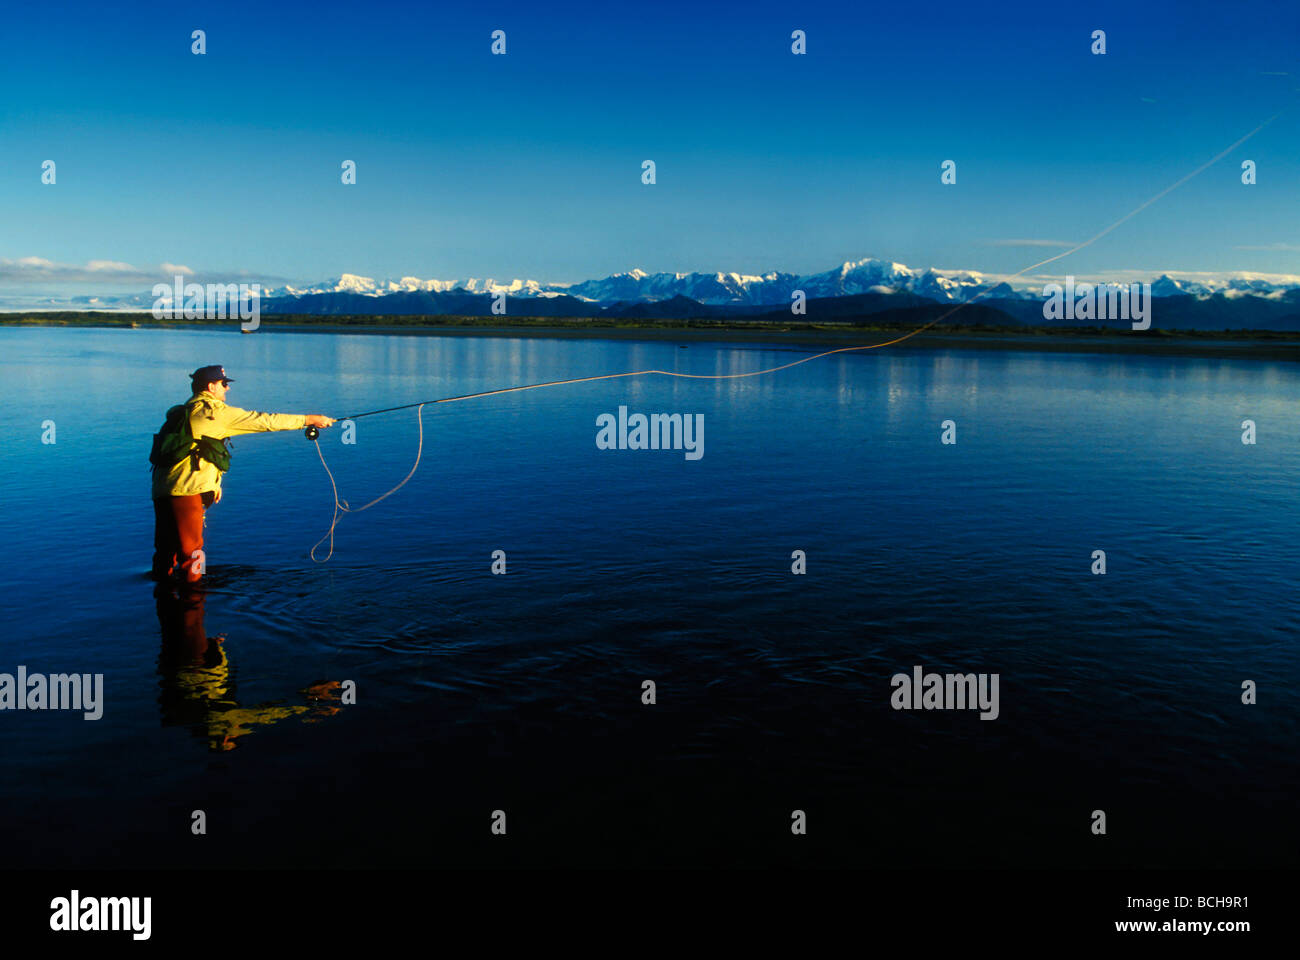 Man fly fishing on the Tsui River, Southeast Alaska, Summer - Stock Image